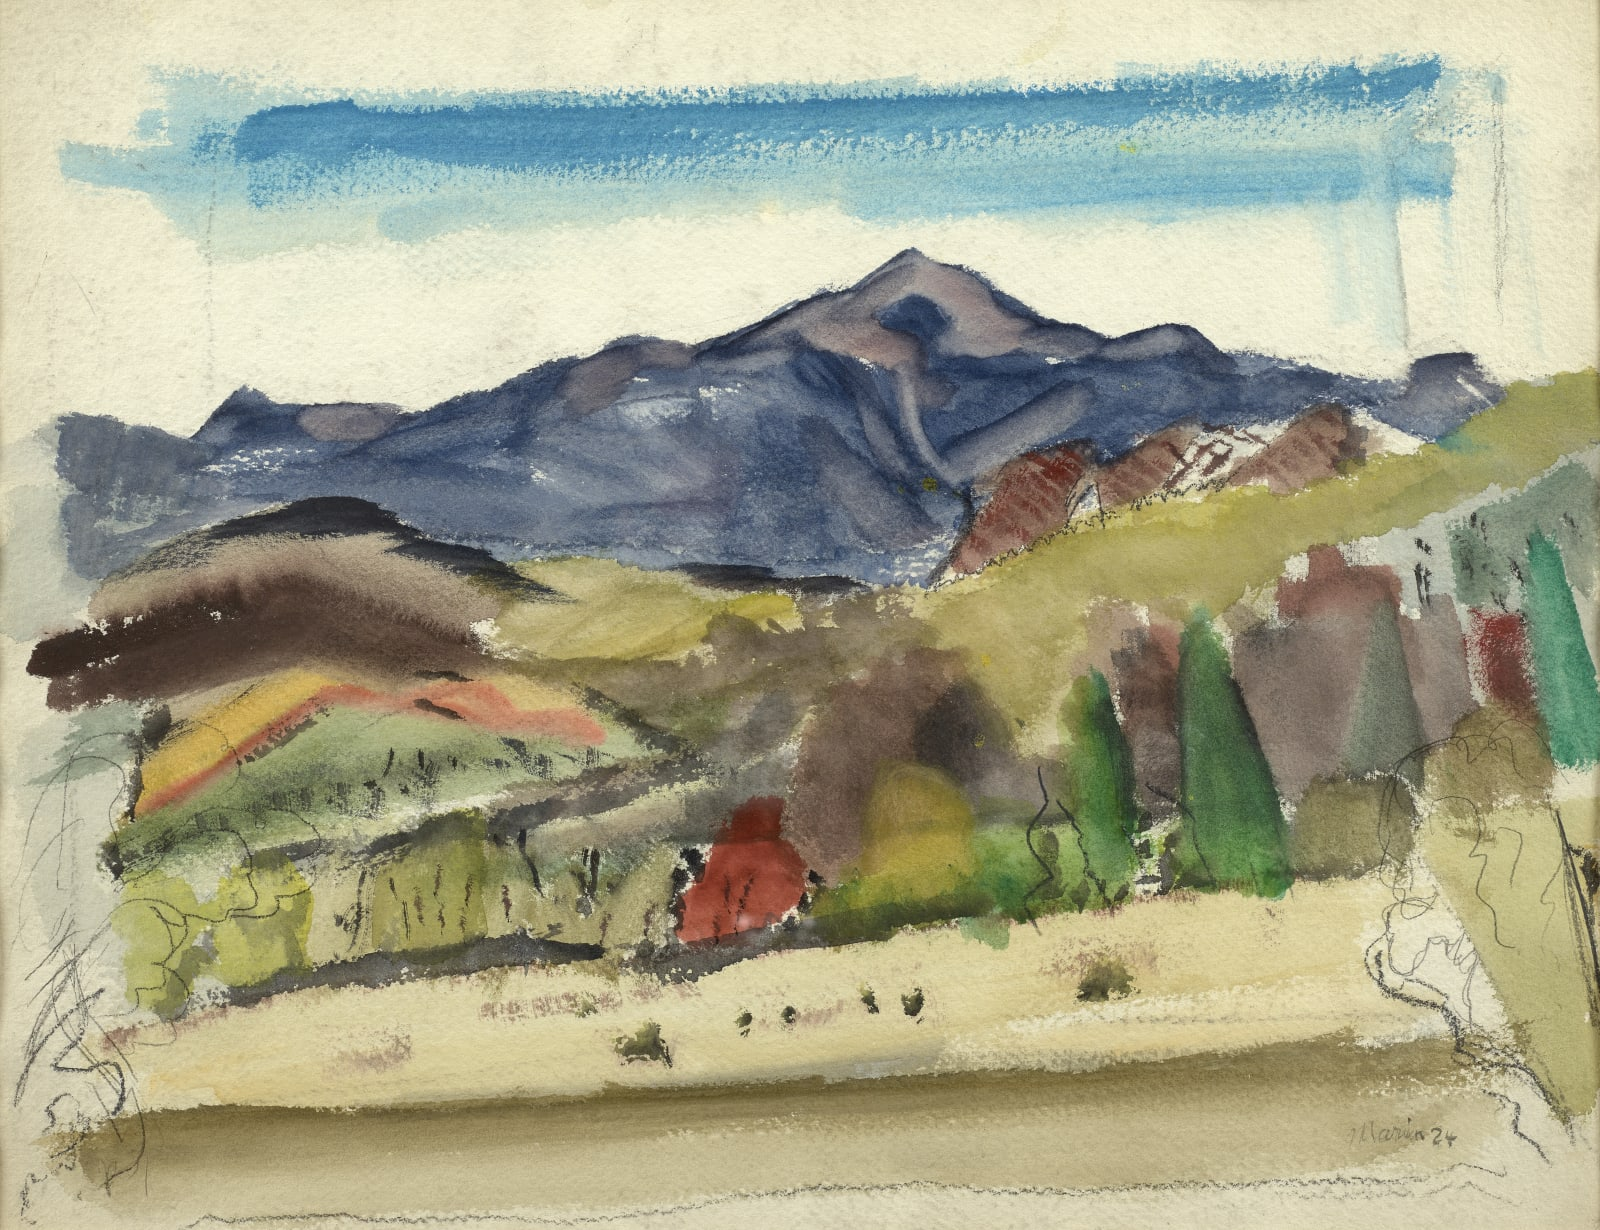 John Marin, Mount Washington, New Hampshire, 1924